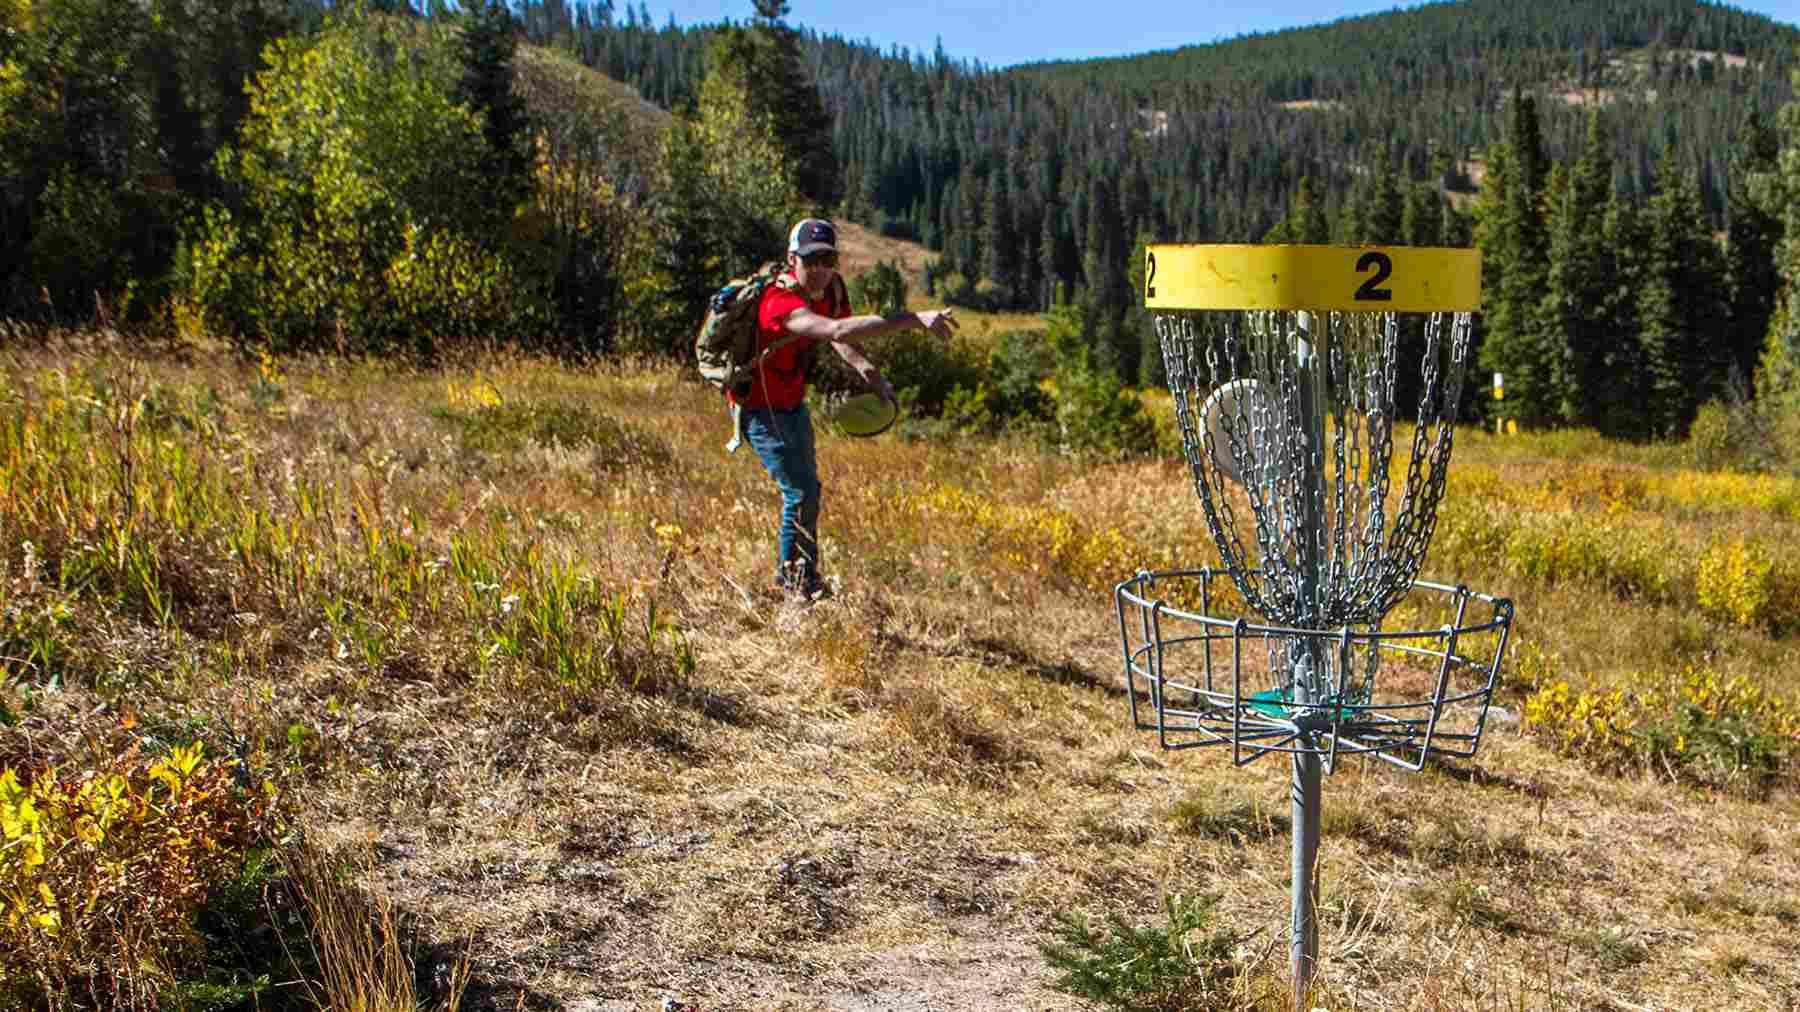 Disc golf at Winter Park Resort